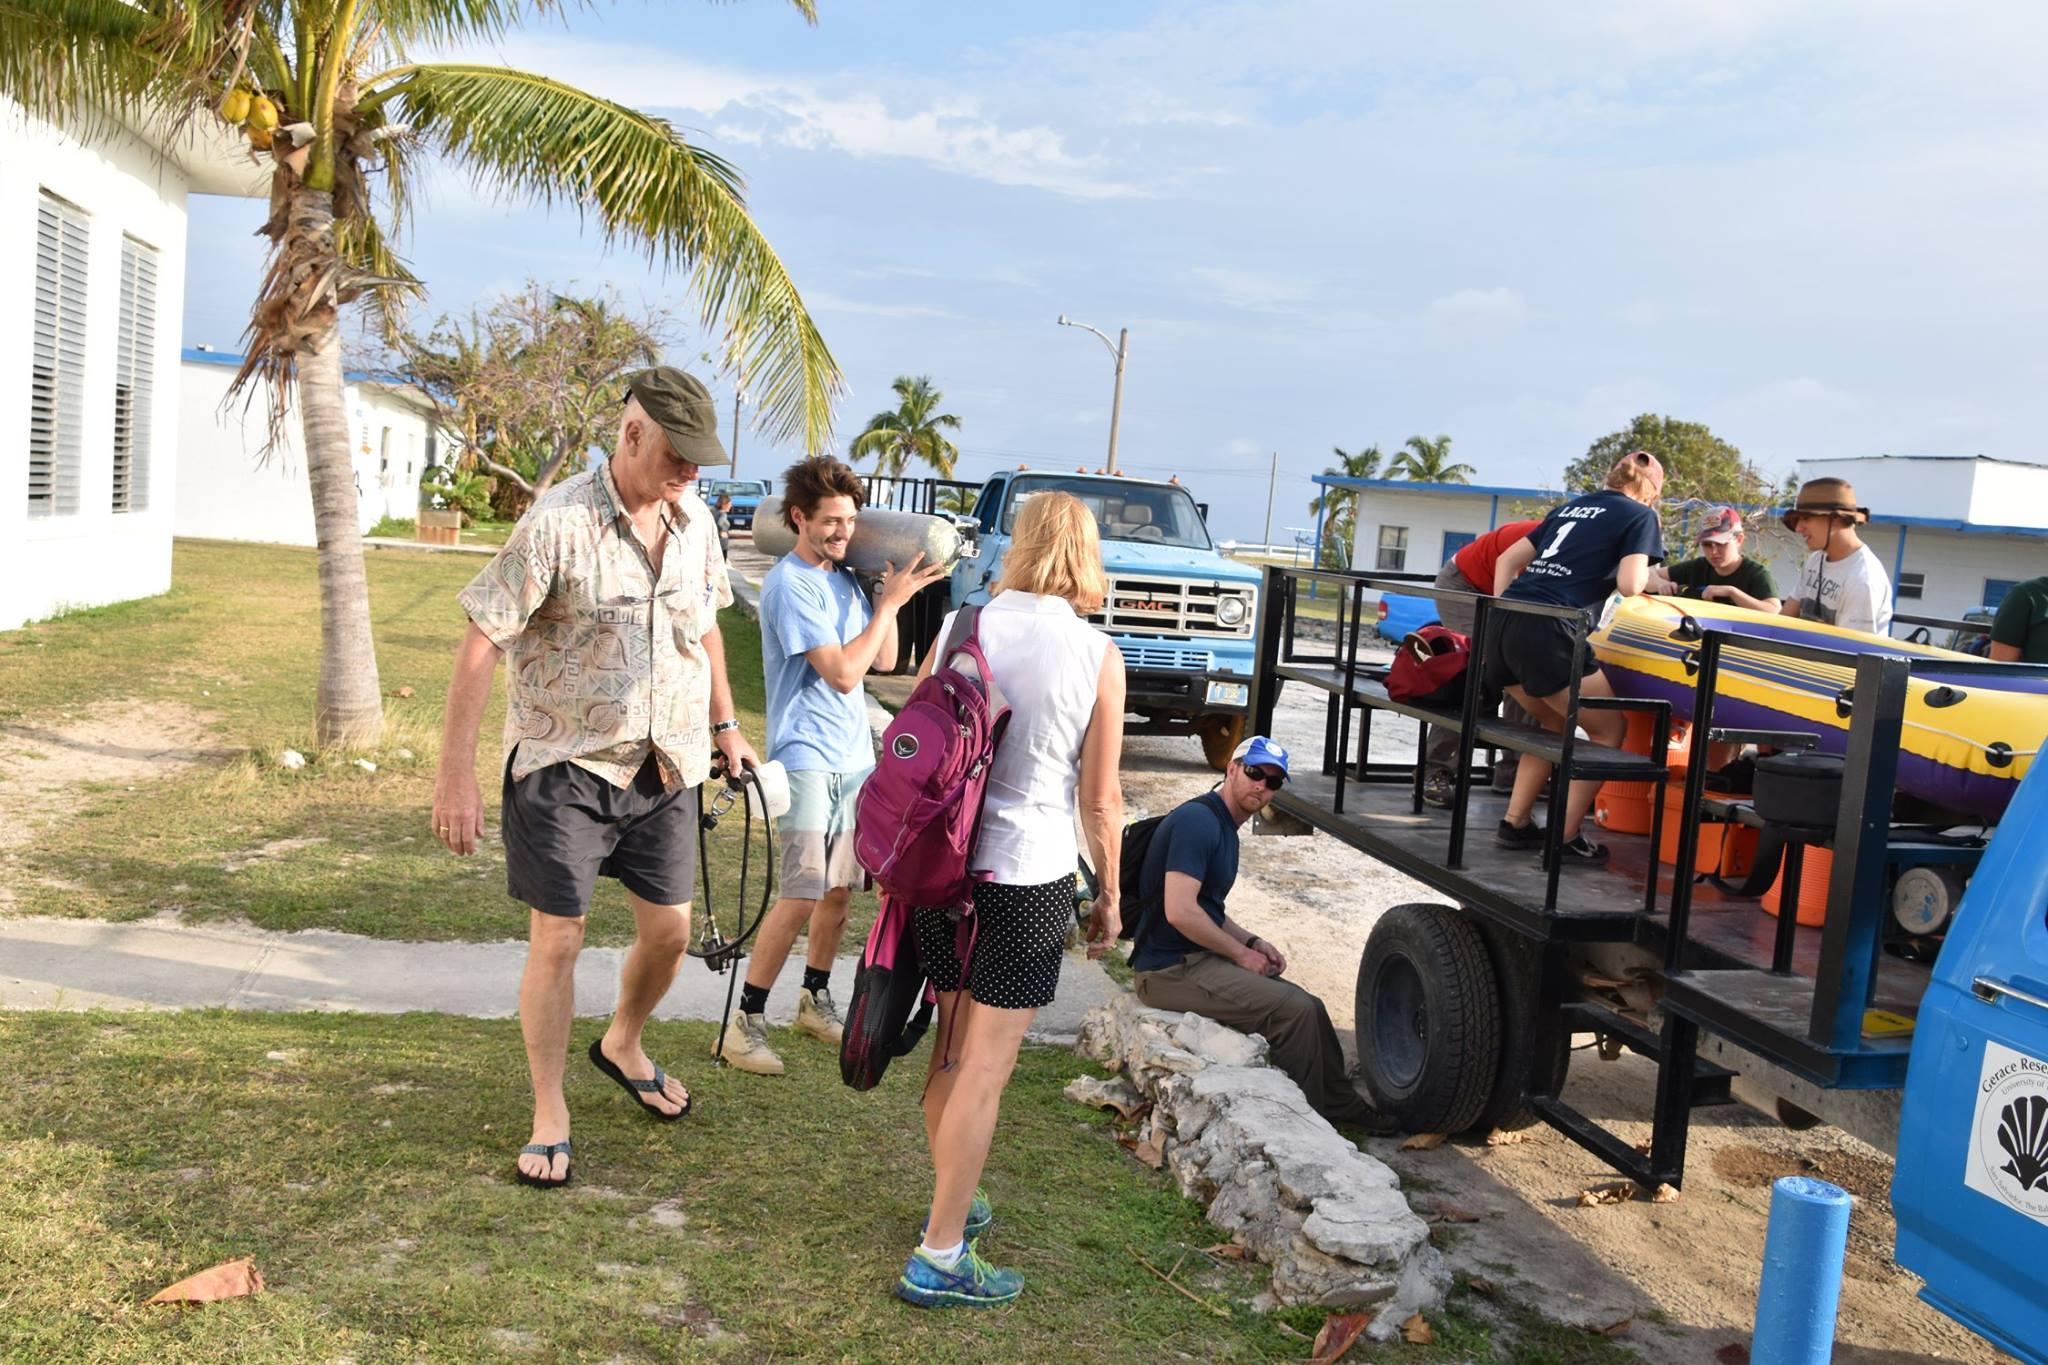 Field Class in the Bahamas